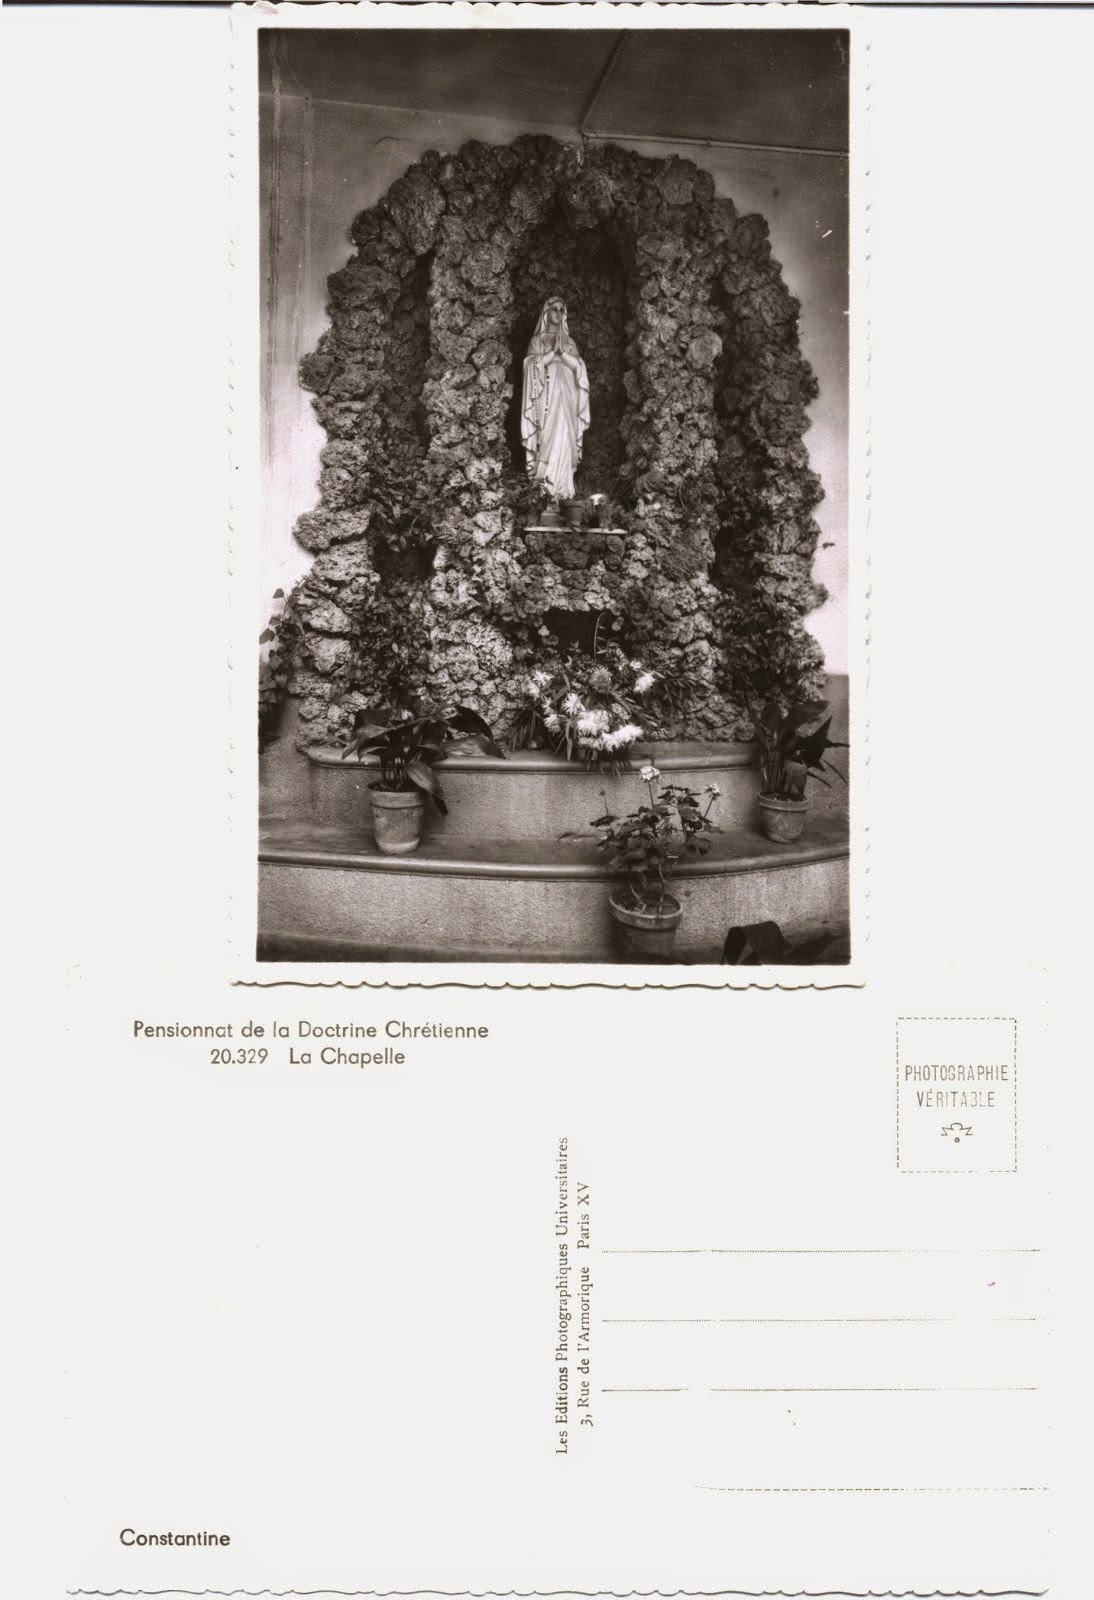 Scoala Catolica Doctrina Crestina Constantine Algeria 1972 1976